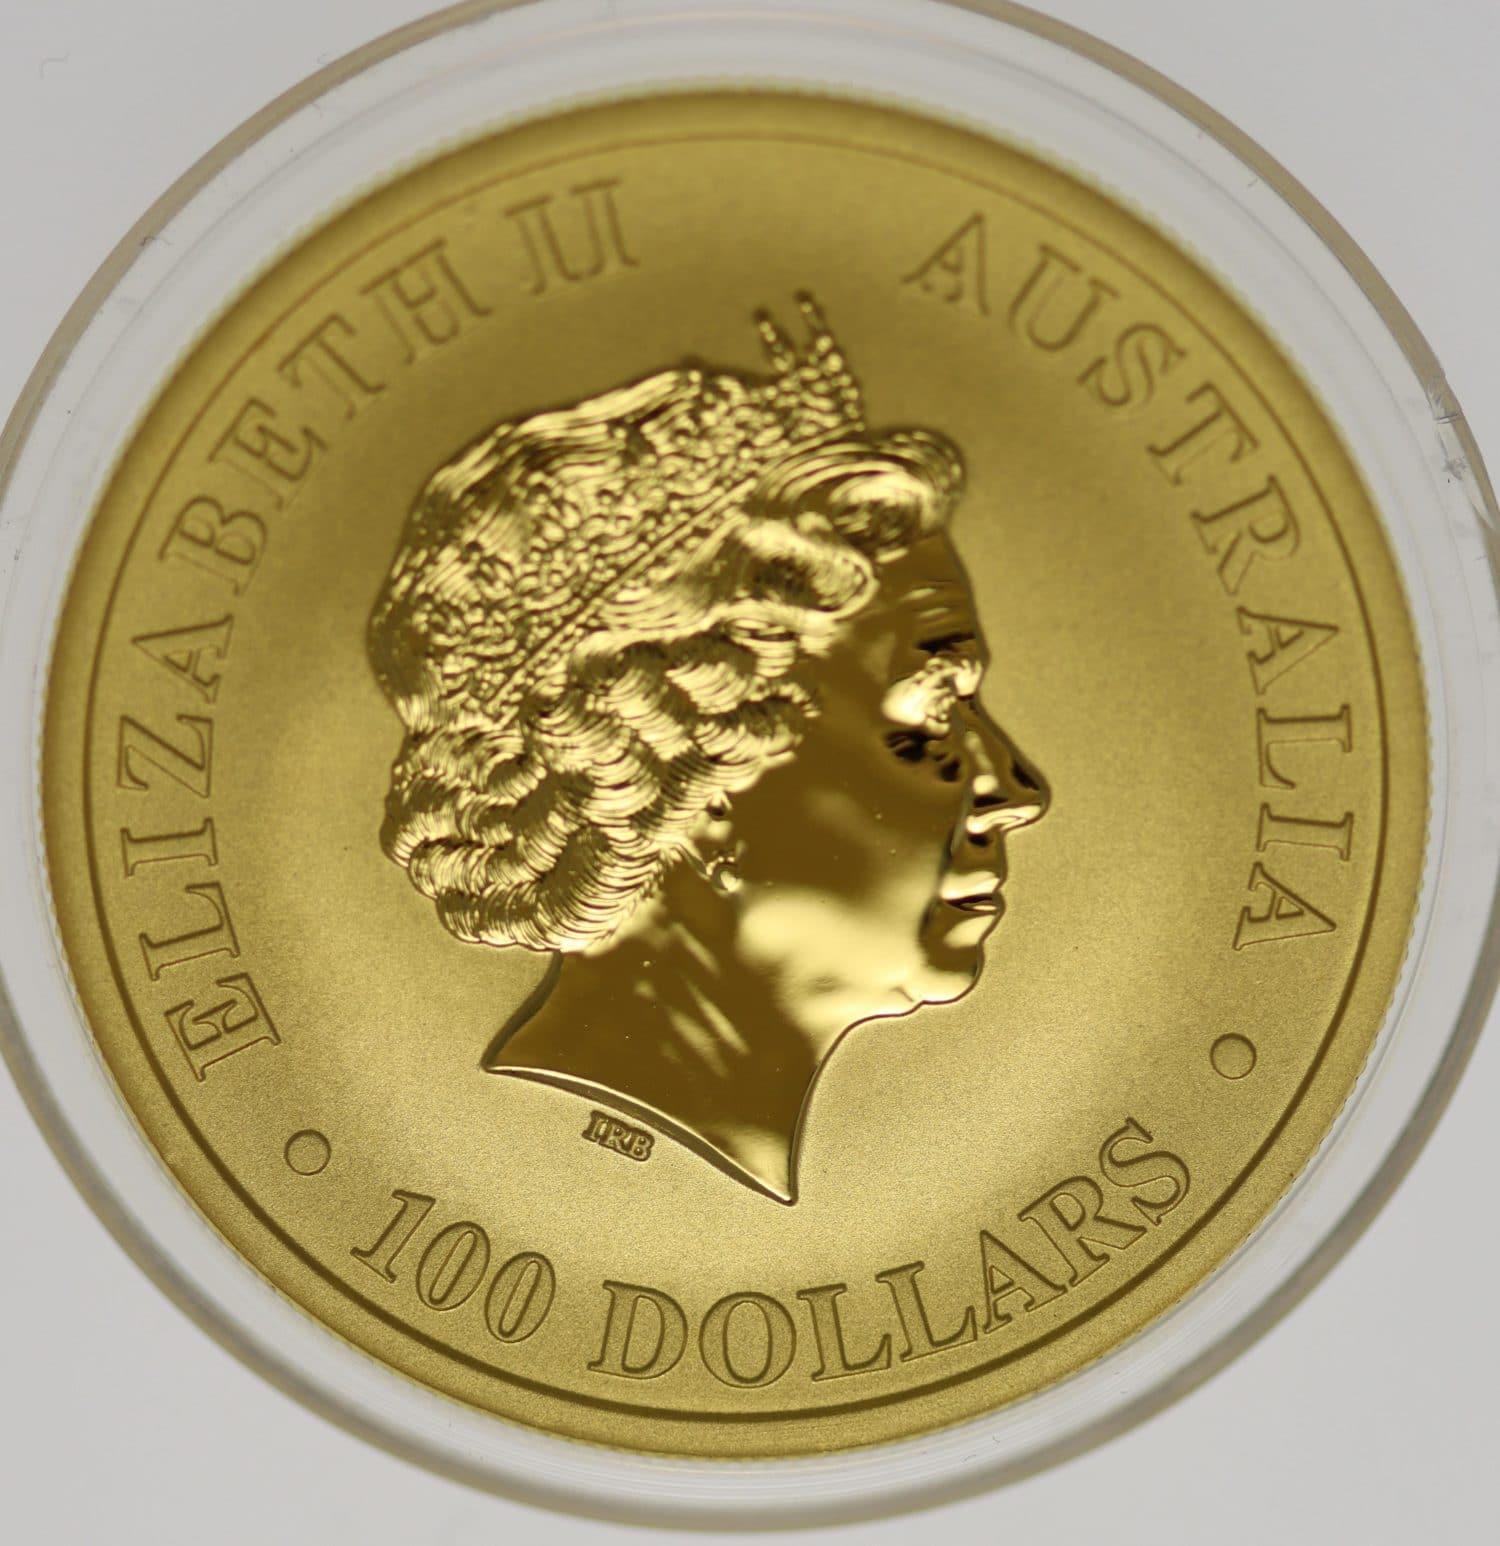 australien - Australien Elisabeth II. 100 Dollars 2018 1 OZ Emu